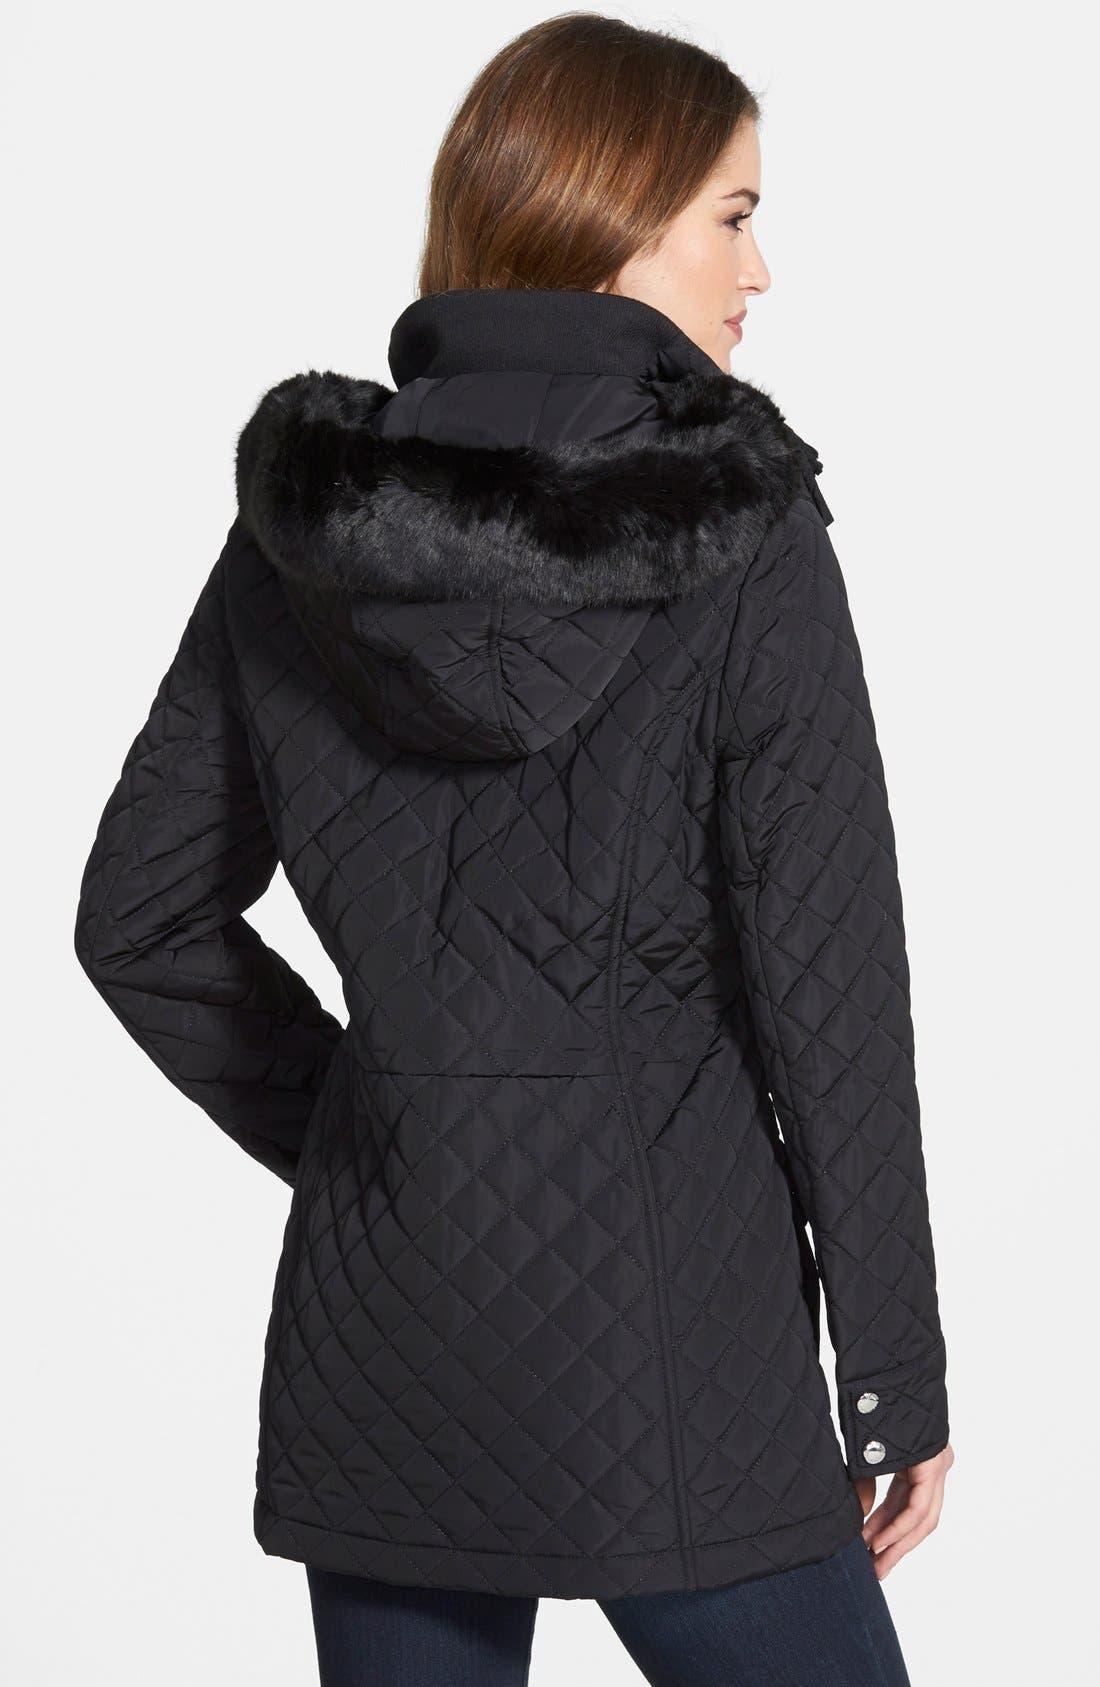 Quilted Coat with Detachable Faux Fur Trim Hood,                             Alternate thumbnail 2, color,                             001